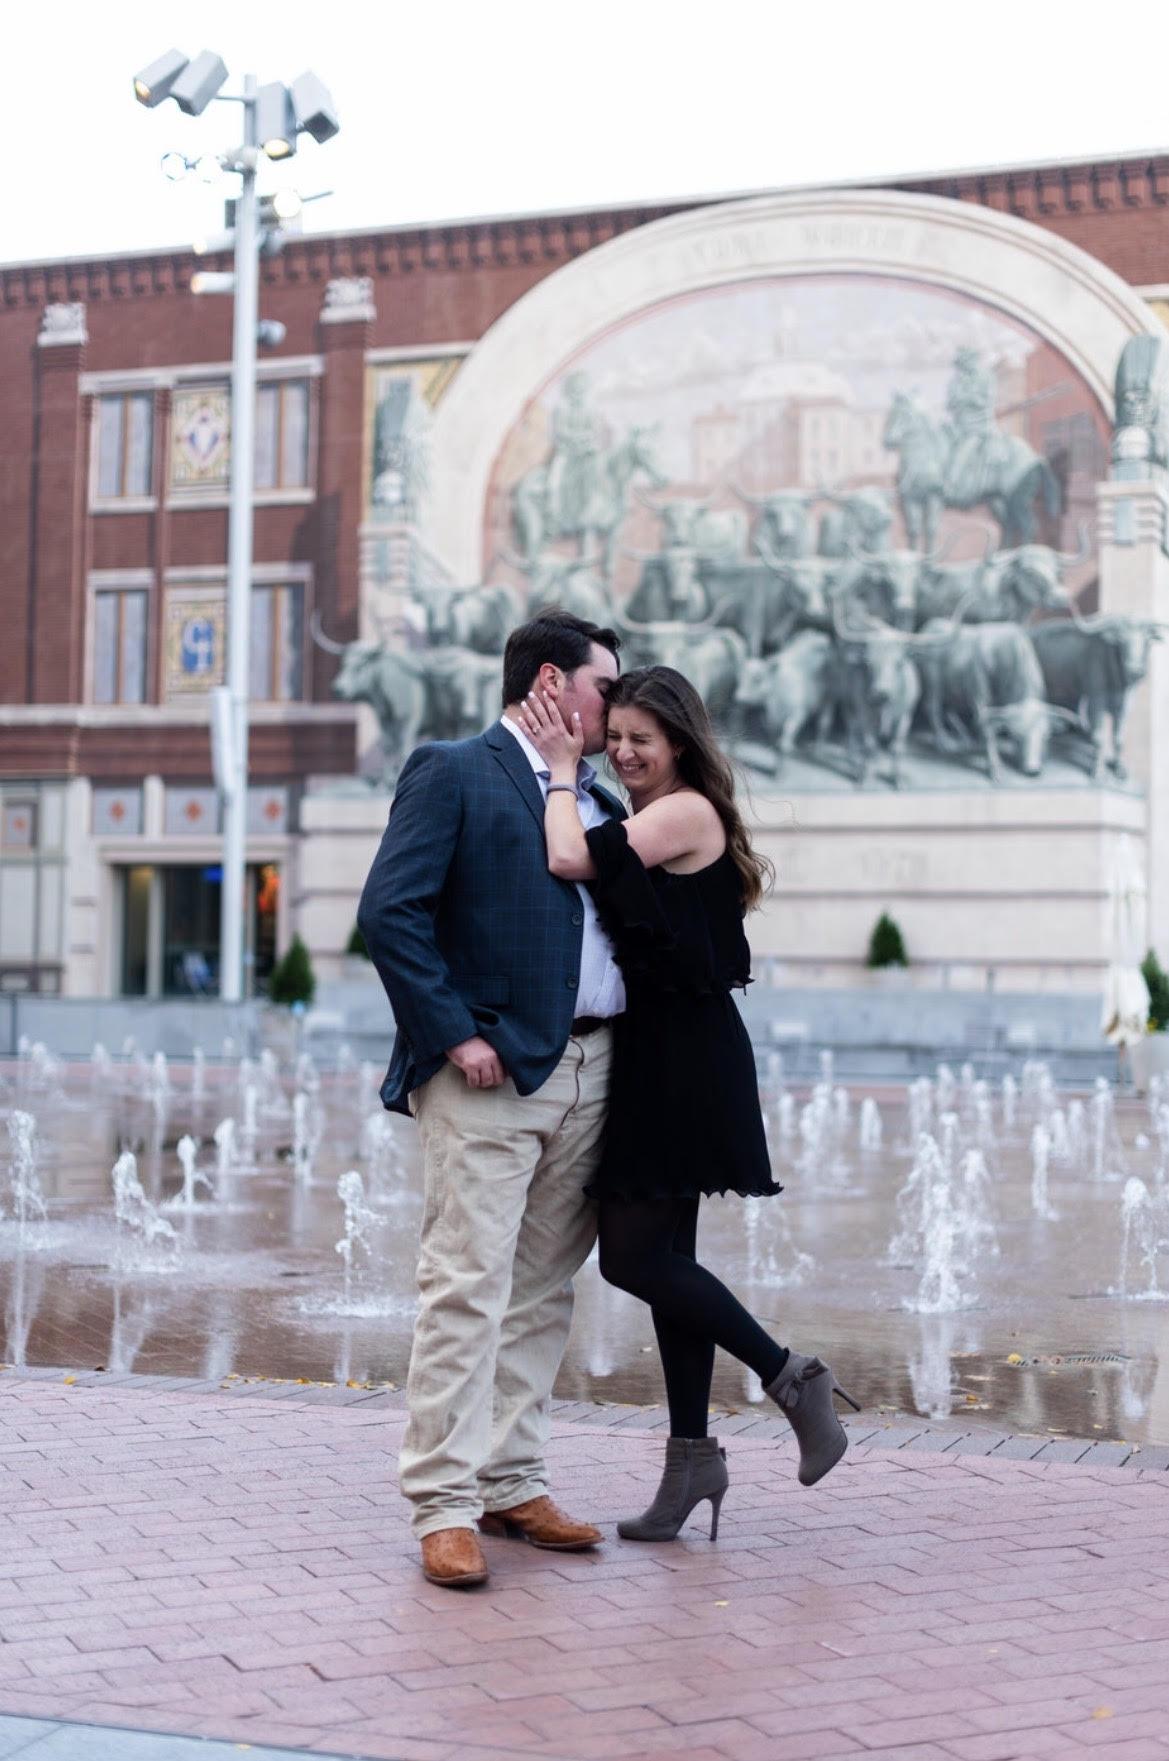 sundance square fort worth wedding proposal